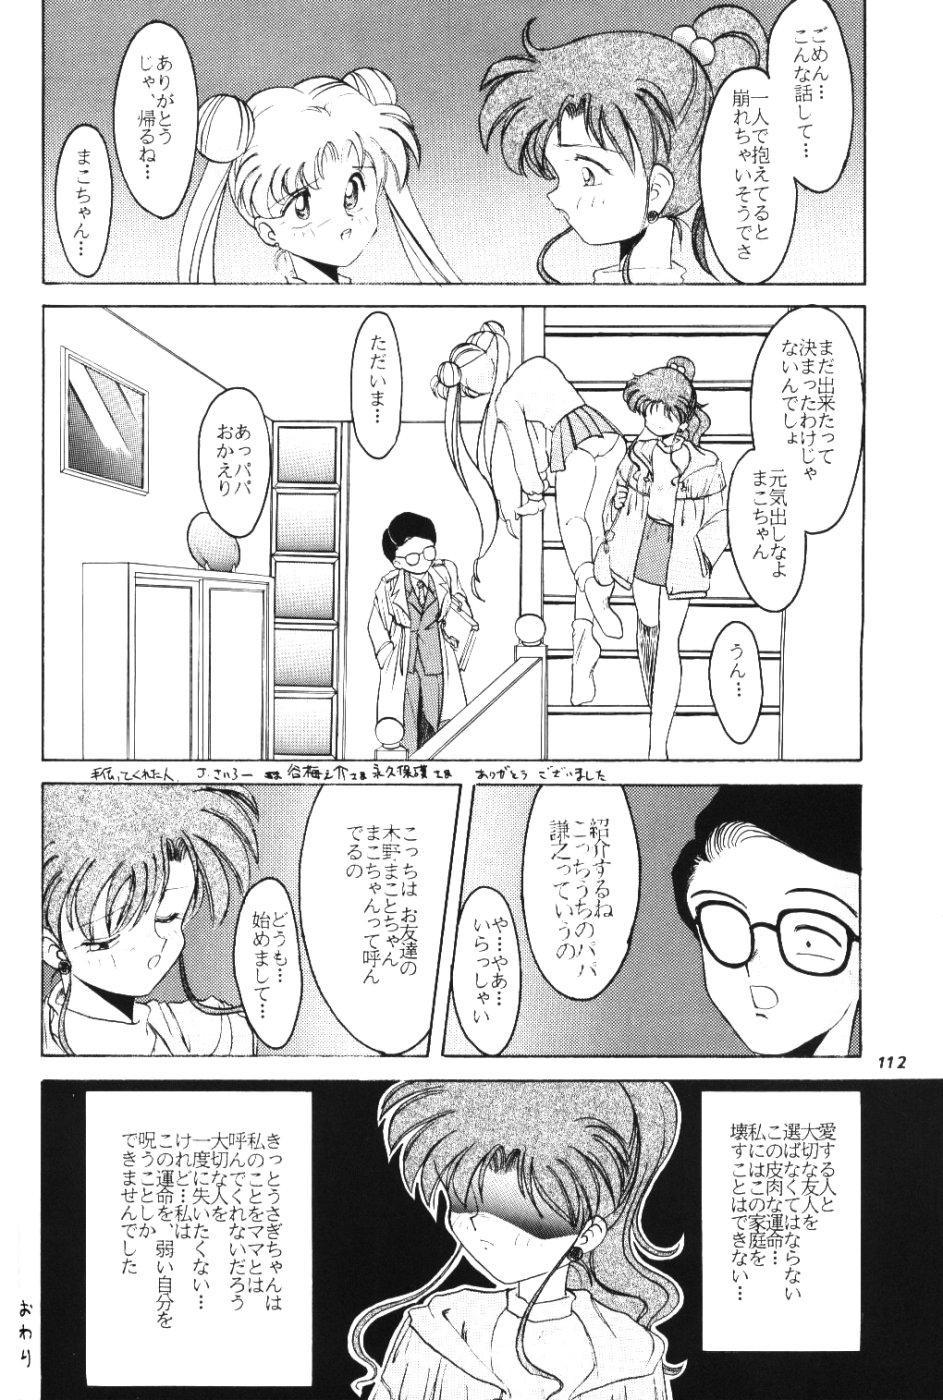 Moon Memories Vol. 2 110